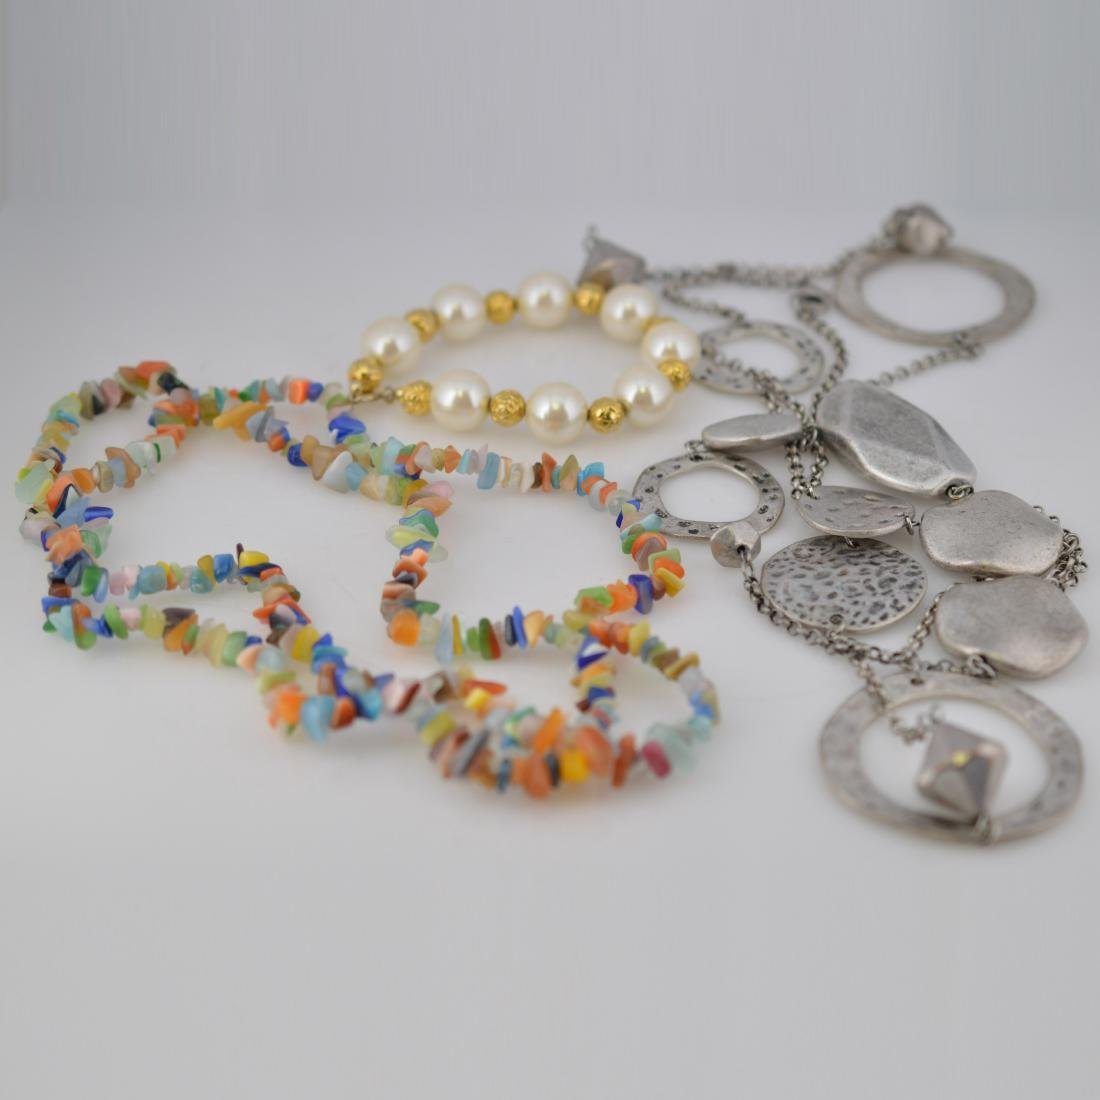 Silver Necklace + Pearl Bracelet + Color-Gem Necklace